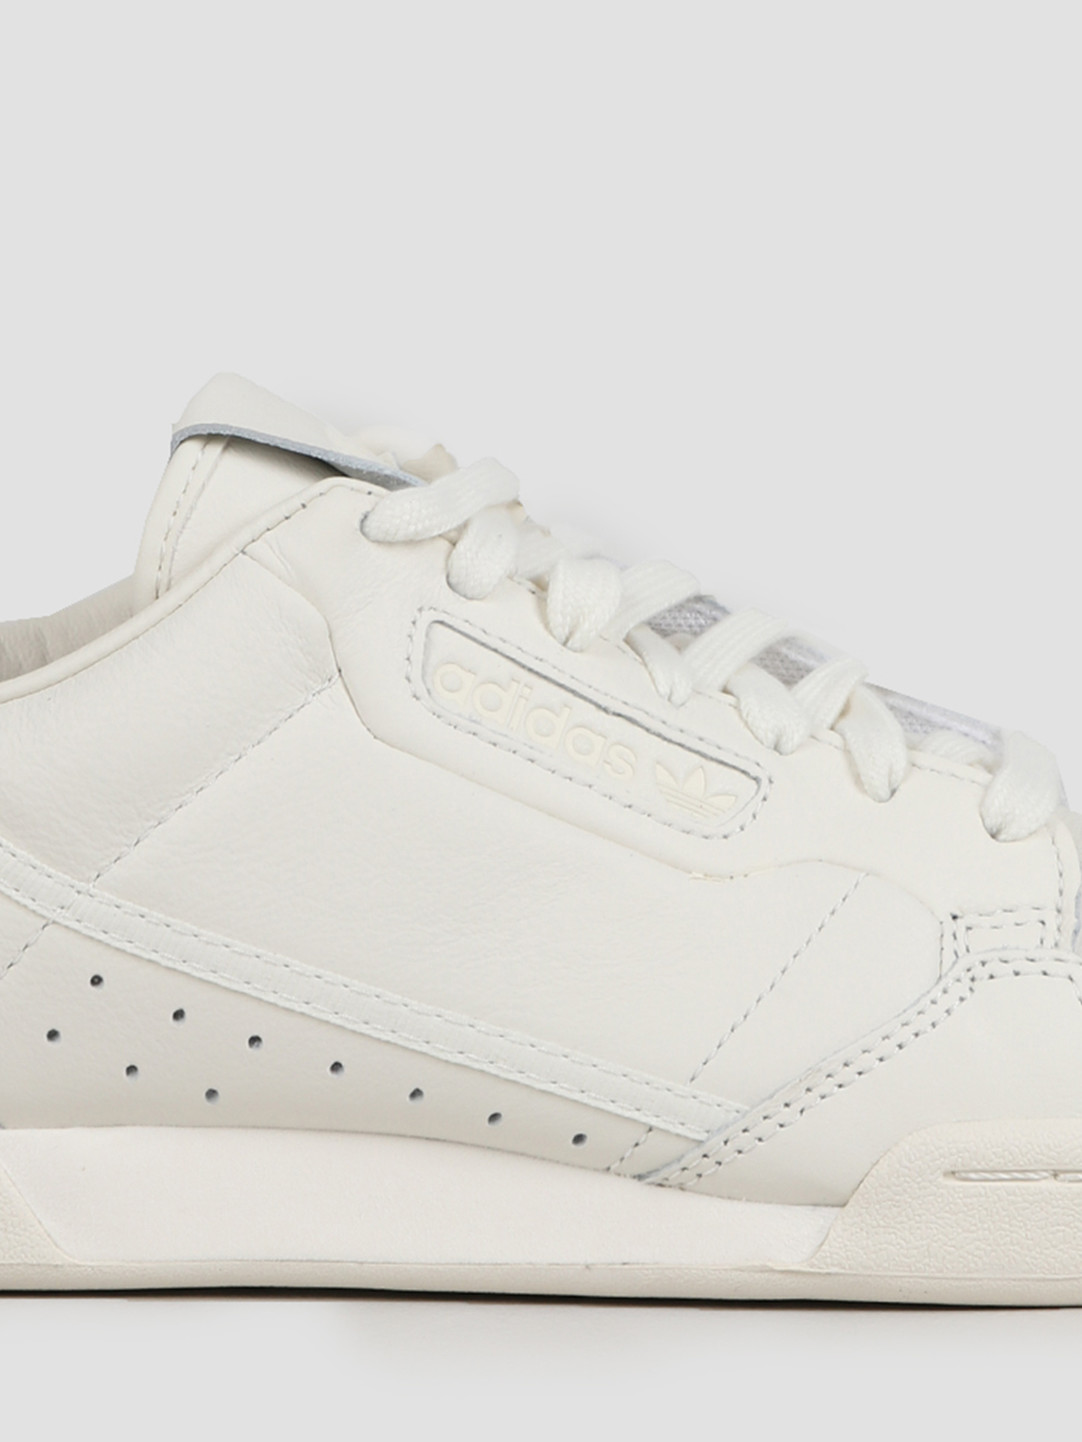 adidas Continental 80 white black red white, 40.5 ab 66,00